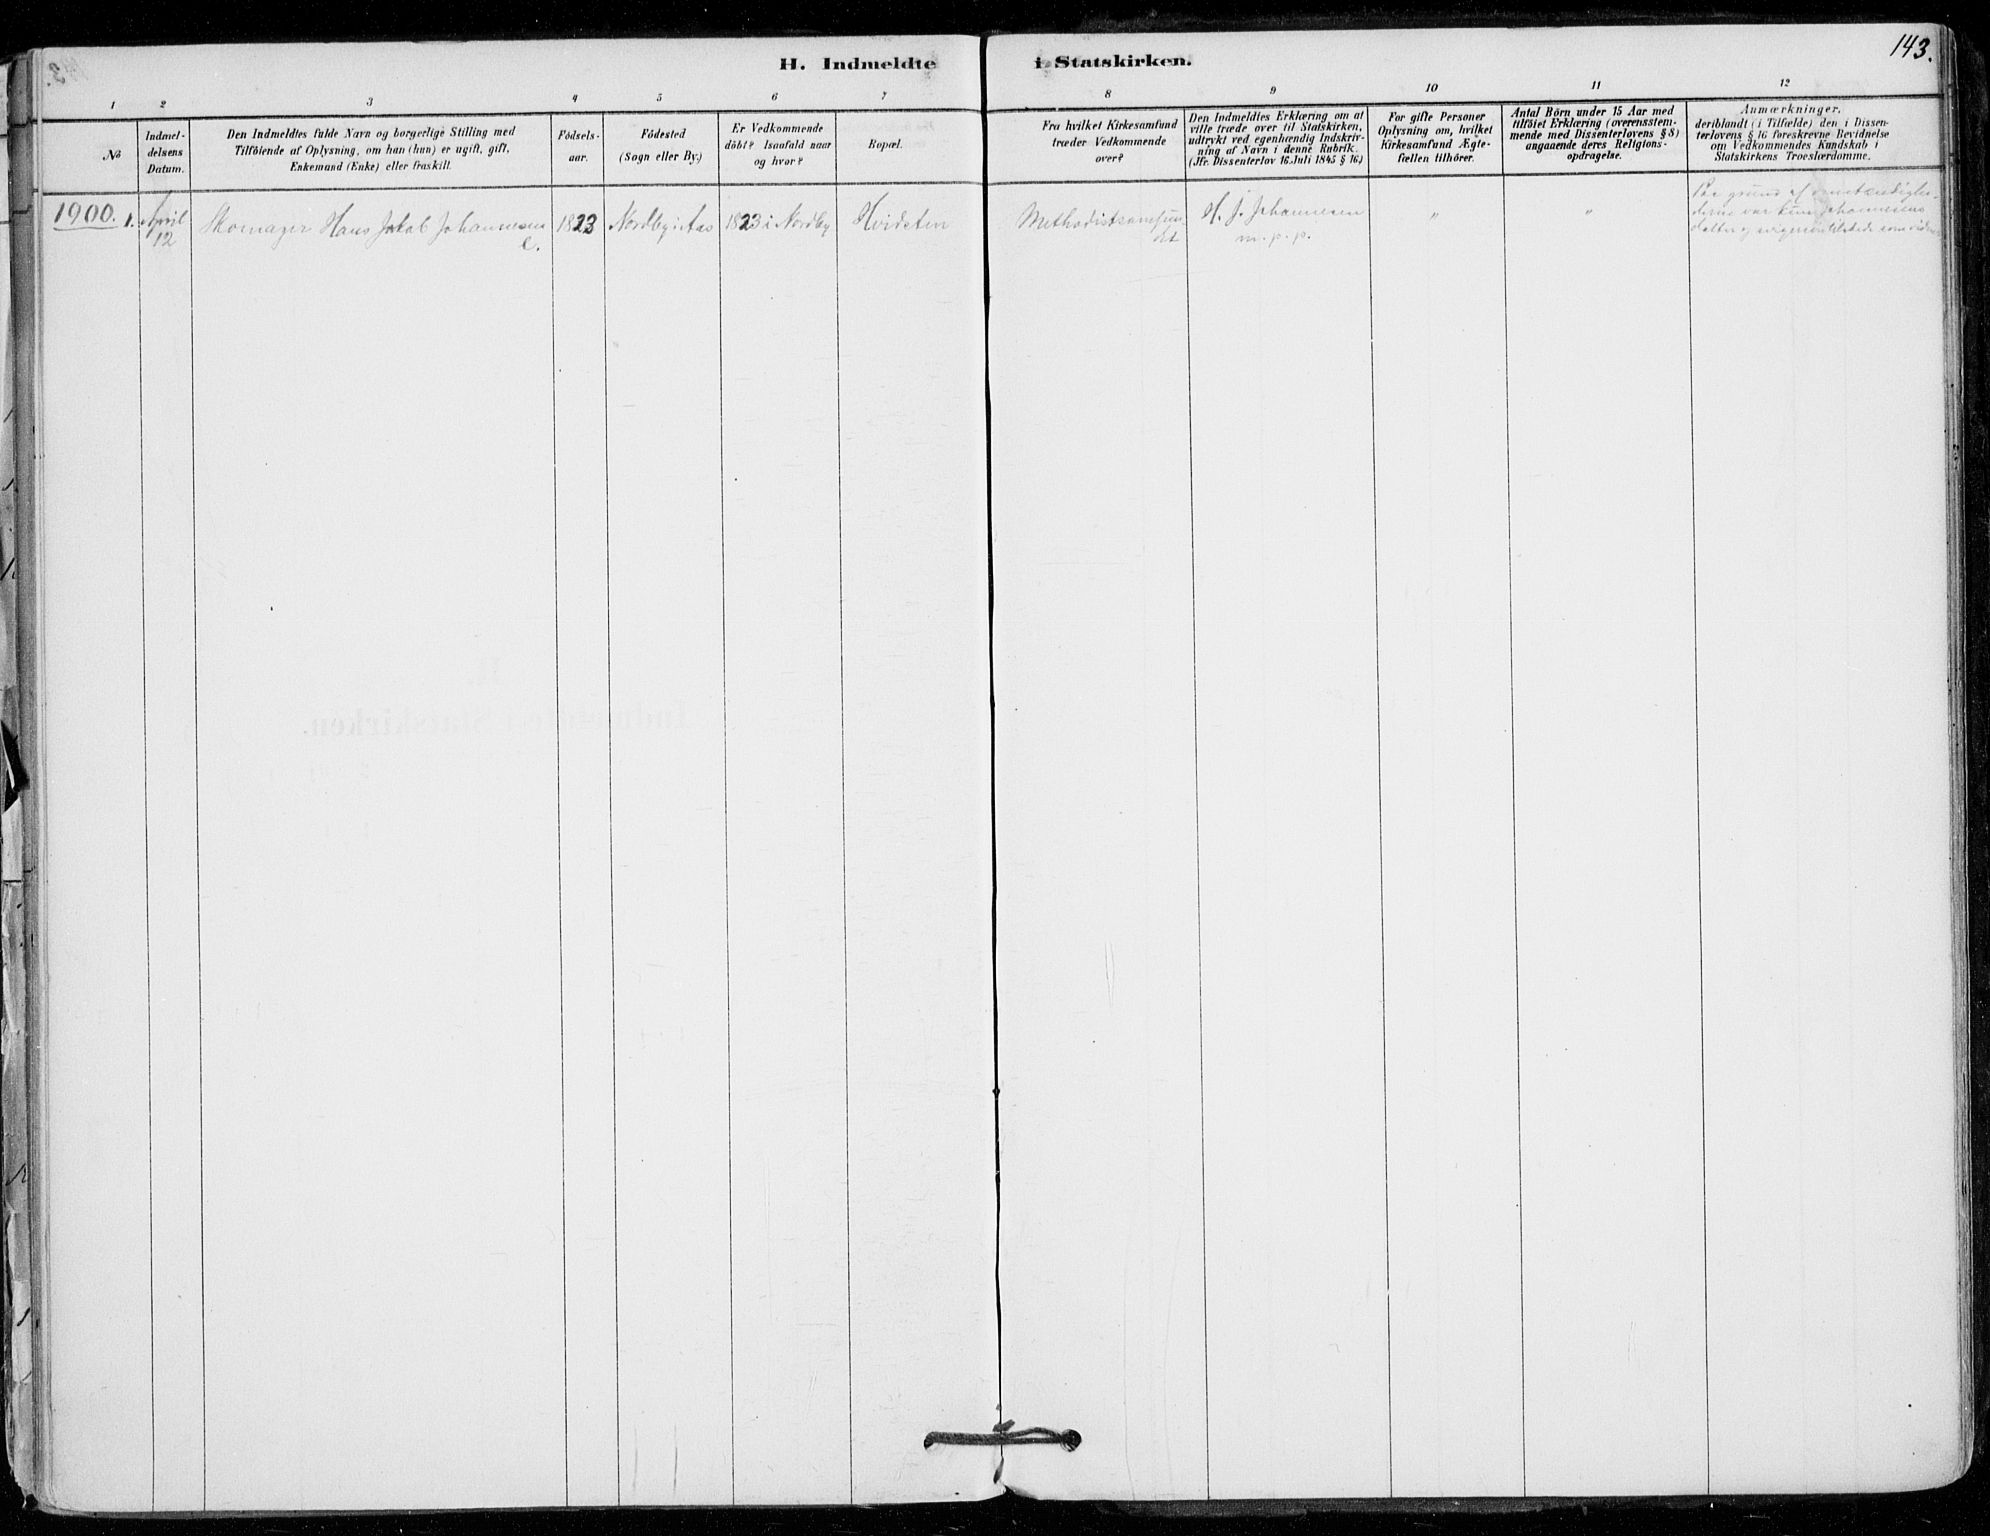 SAO, Vestby prestekontor Kirkebøker, F/Fd/L0001: Ministerialbok nr. IV 1, 1878-1945, s. 143